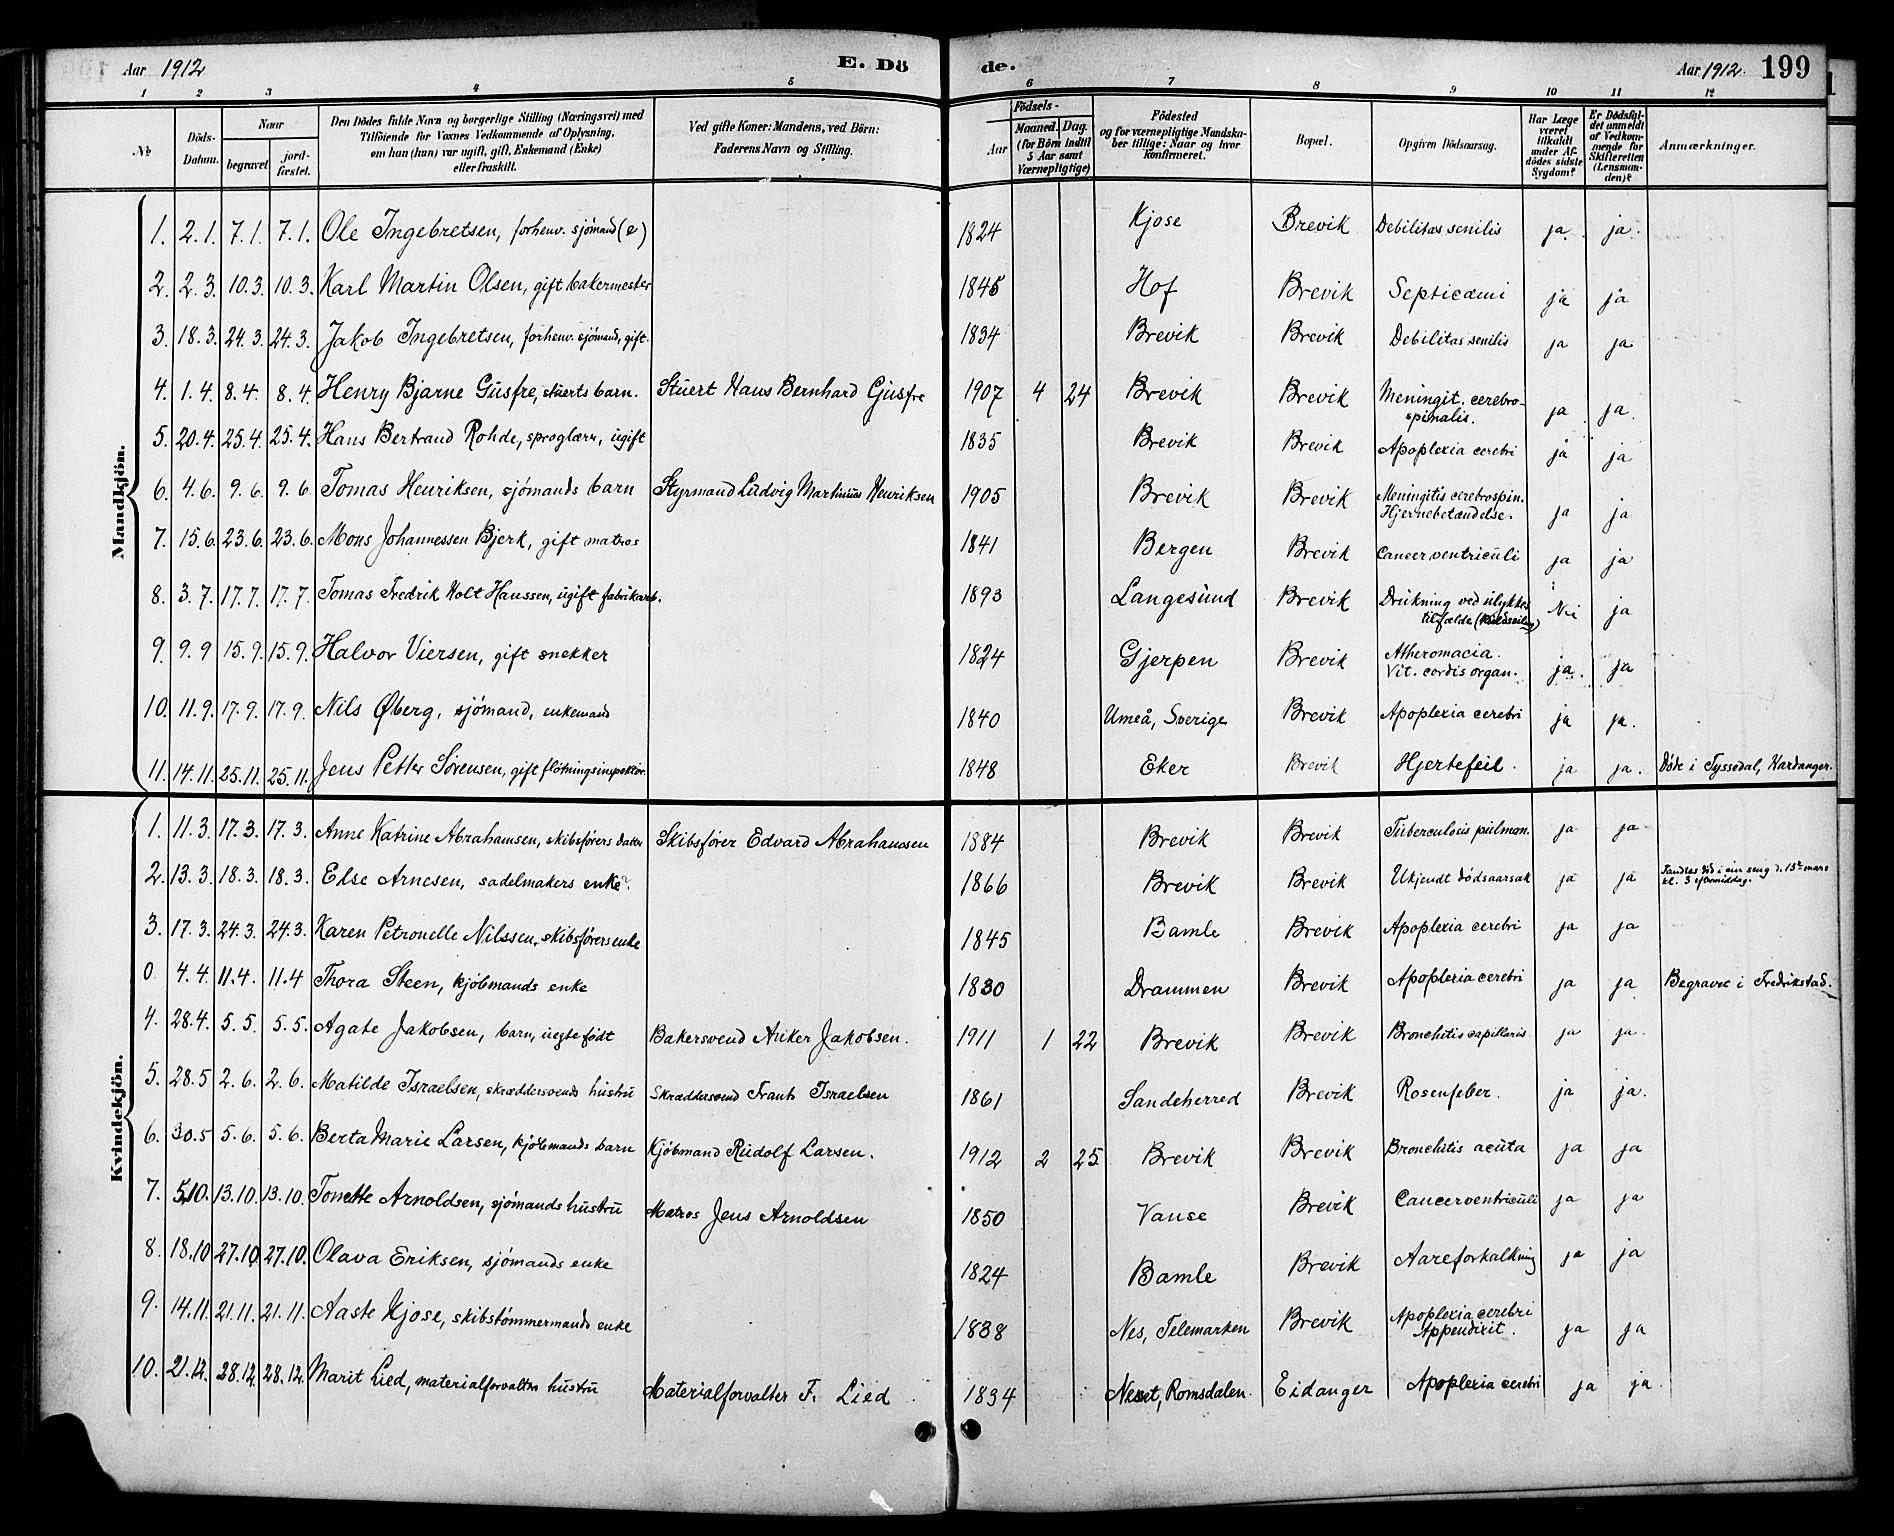 SAKO, Brevik kirkebøker, G/Ga/L0005: Klokkerbok nr. 5, 1901-1924, s. 199